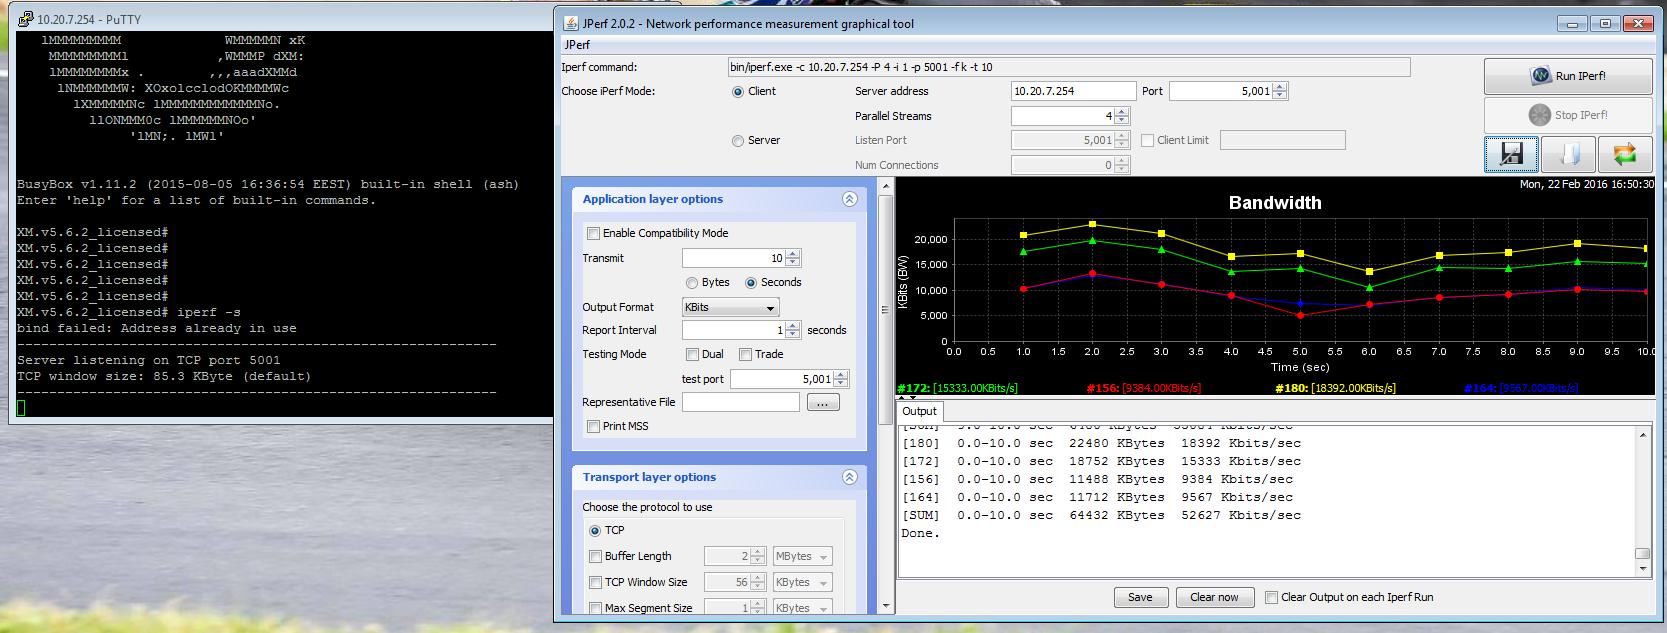 WISP Network - slow download but fast upload | Ubiquiti